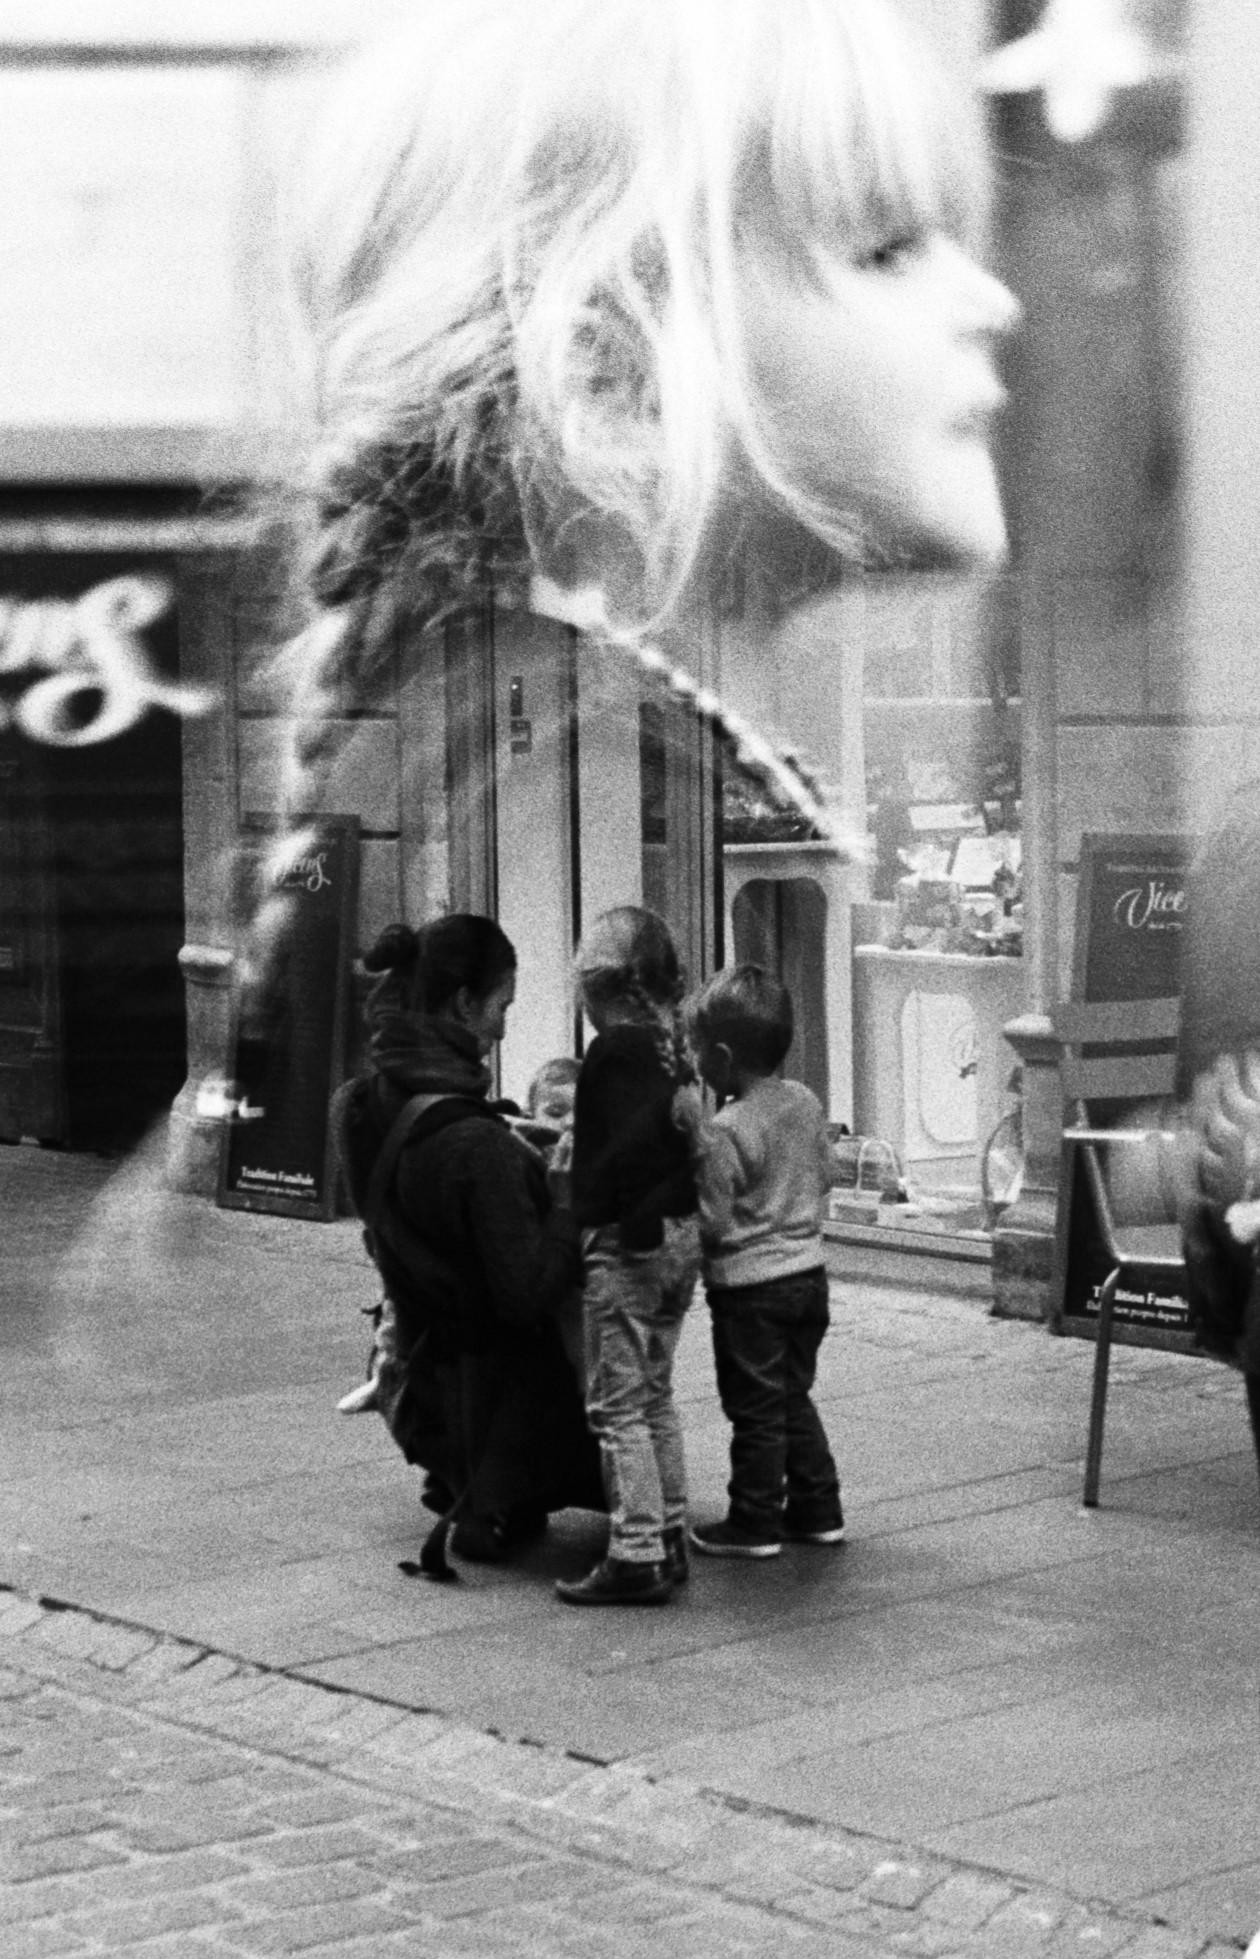 The Forgotten | Copyright © David Allen